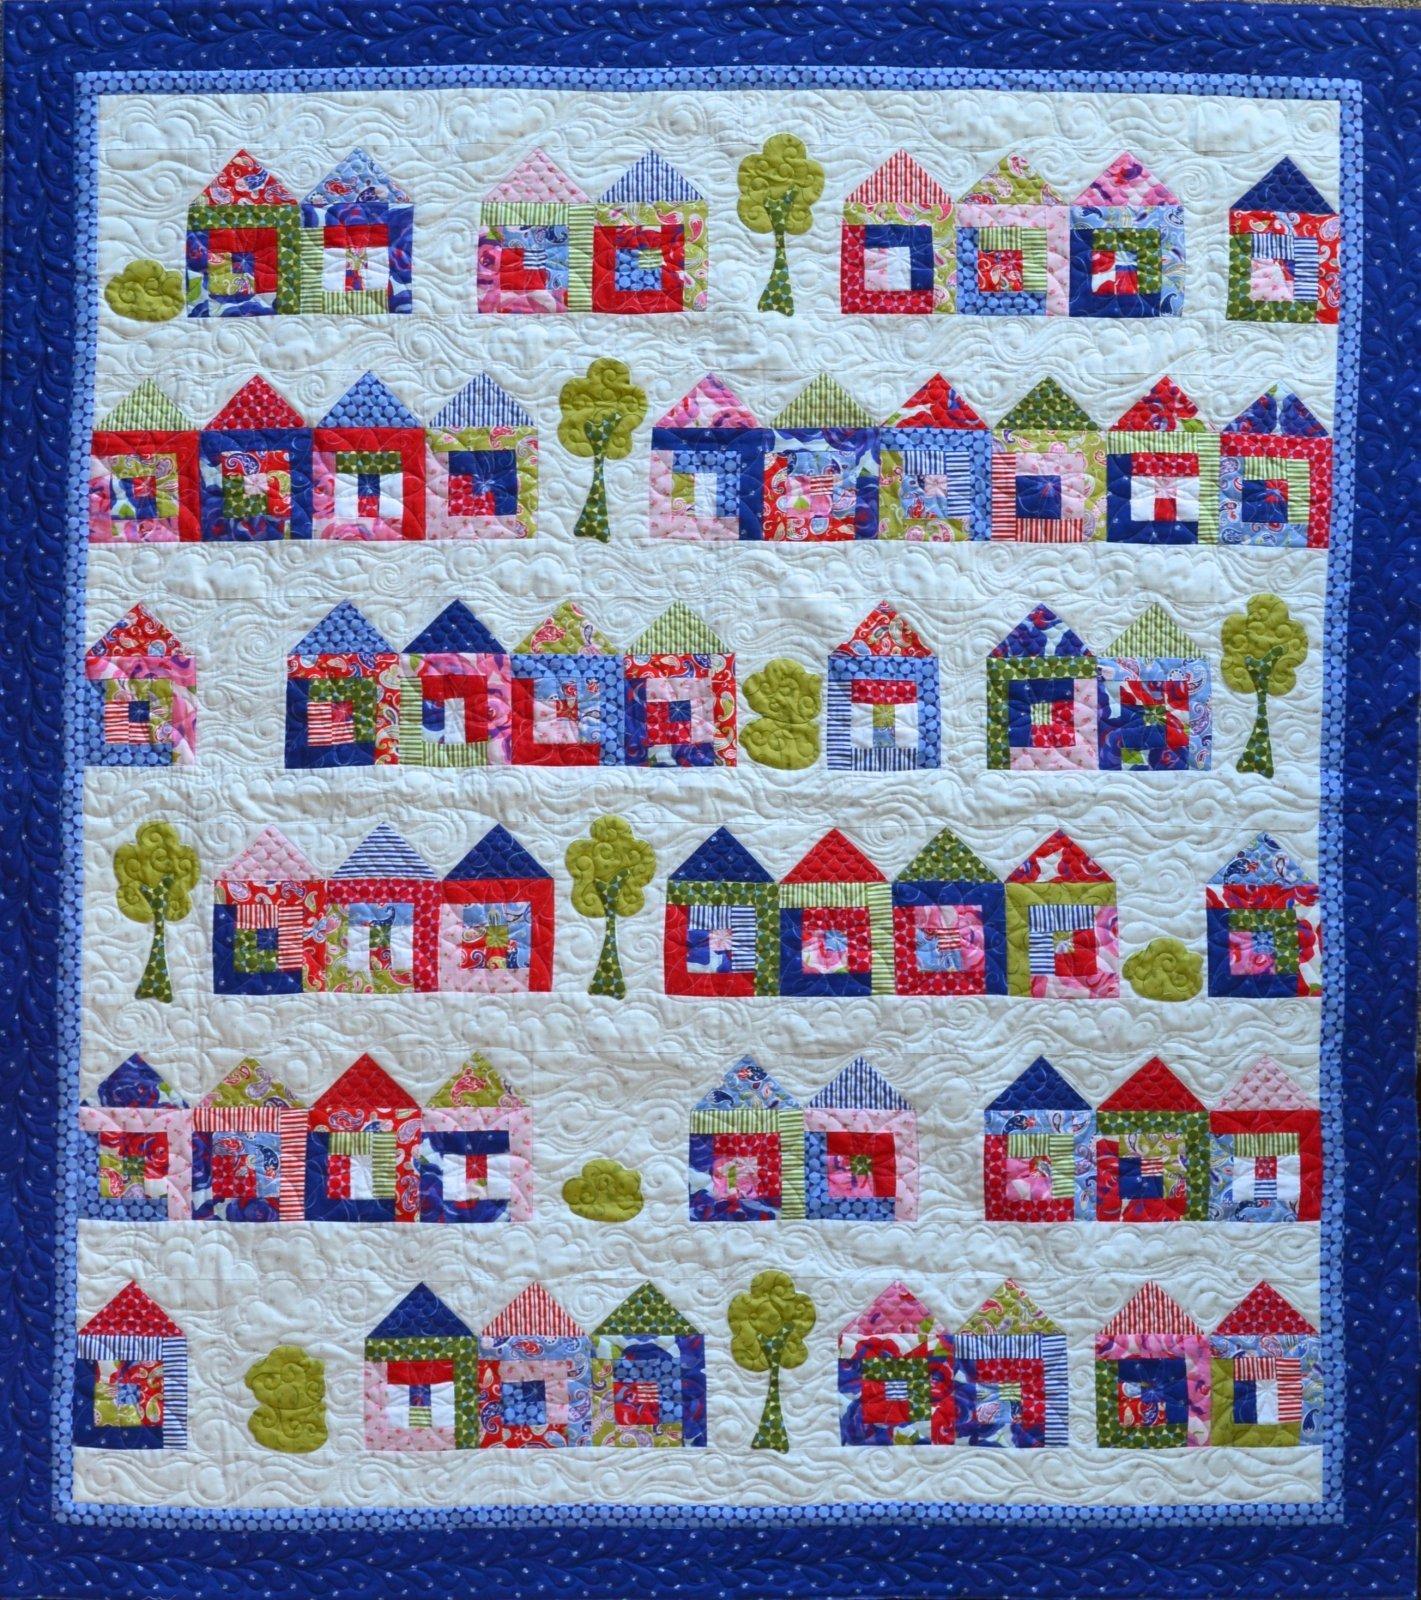 Jillily Studio - Tiny House Craze